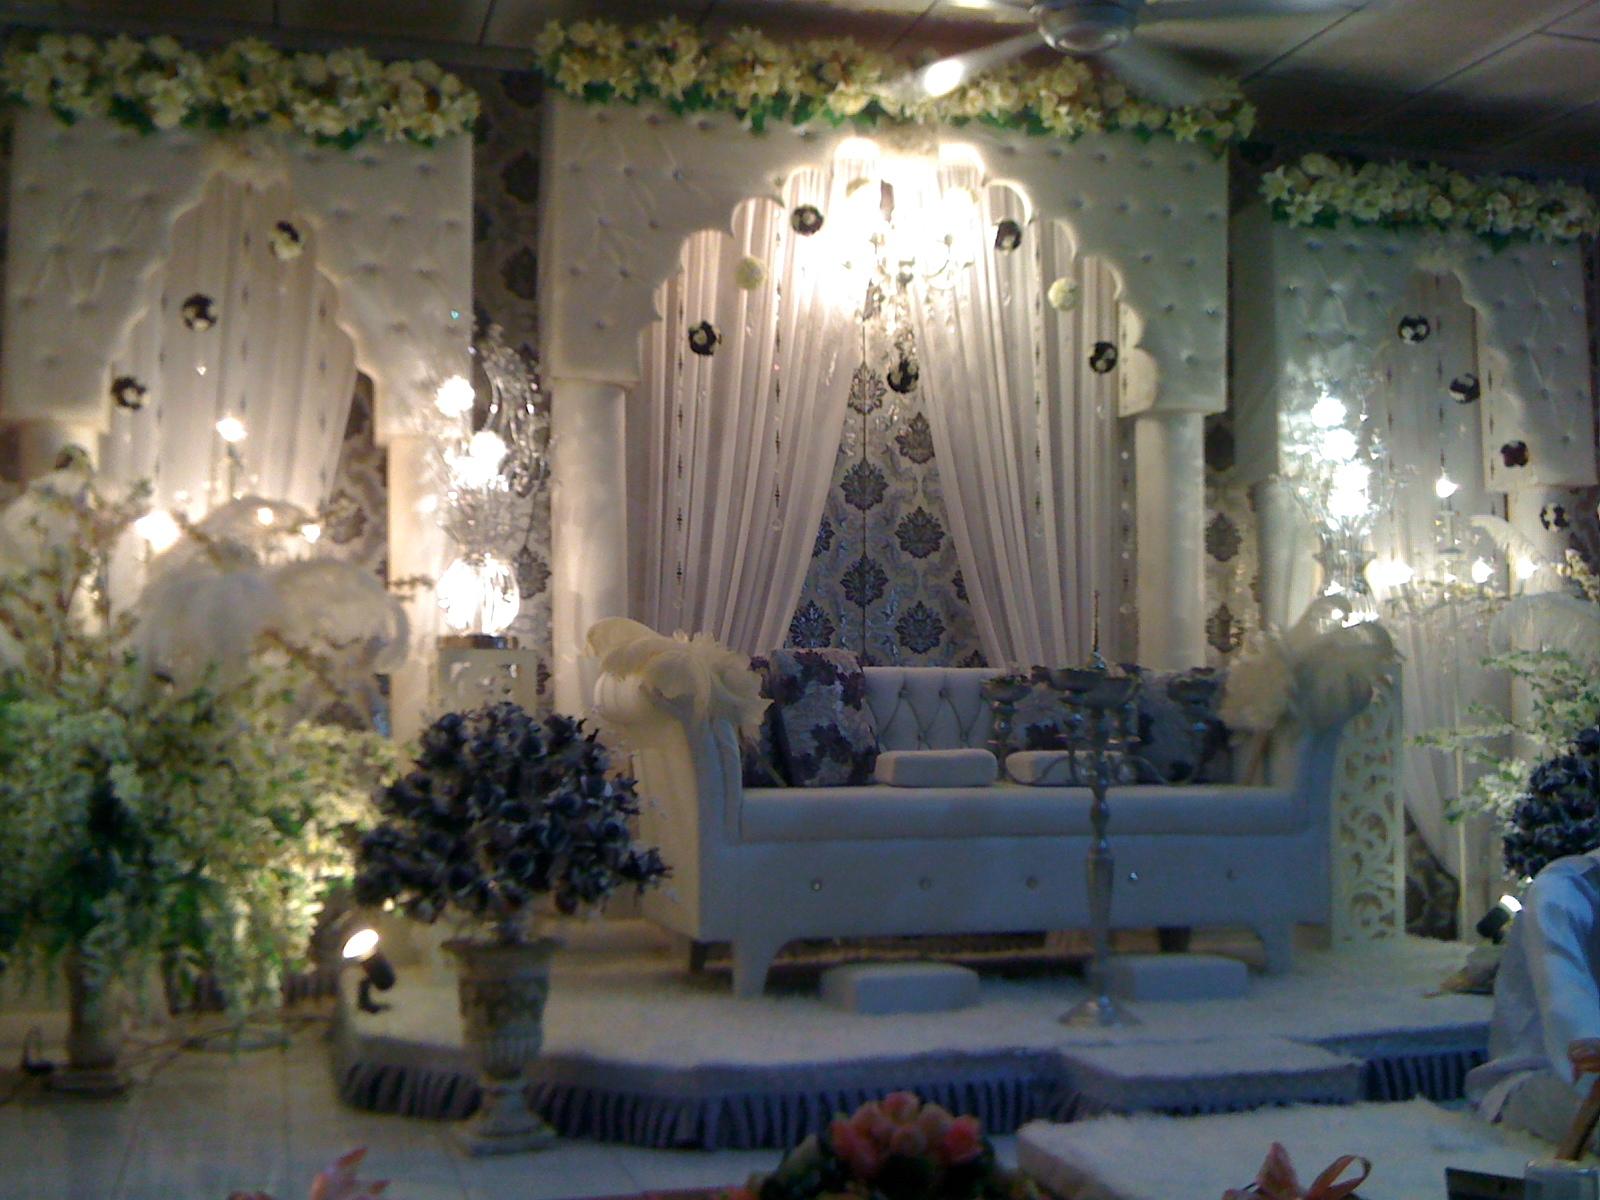 Iedaeak cousins wedding at muar johor cousins wedding at muar johor junglespirit Gallery